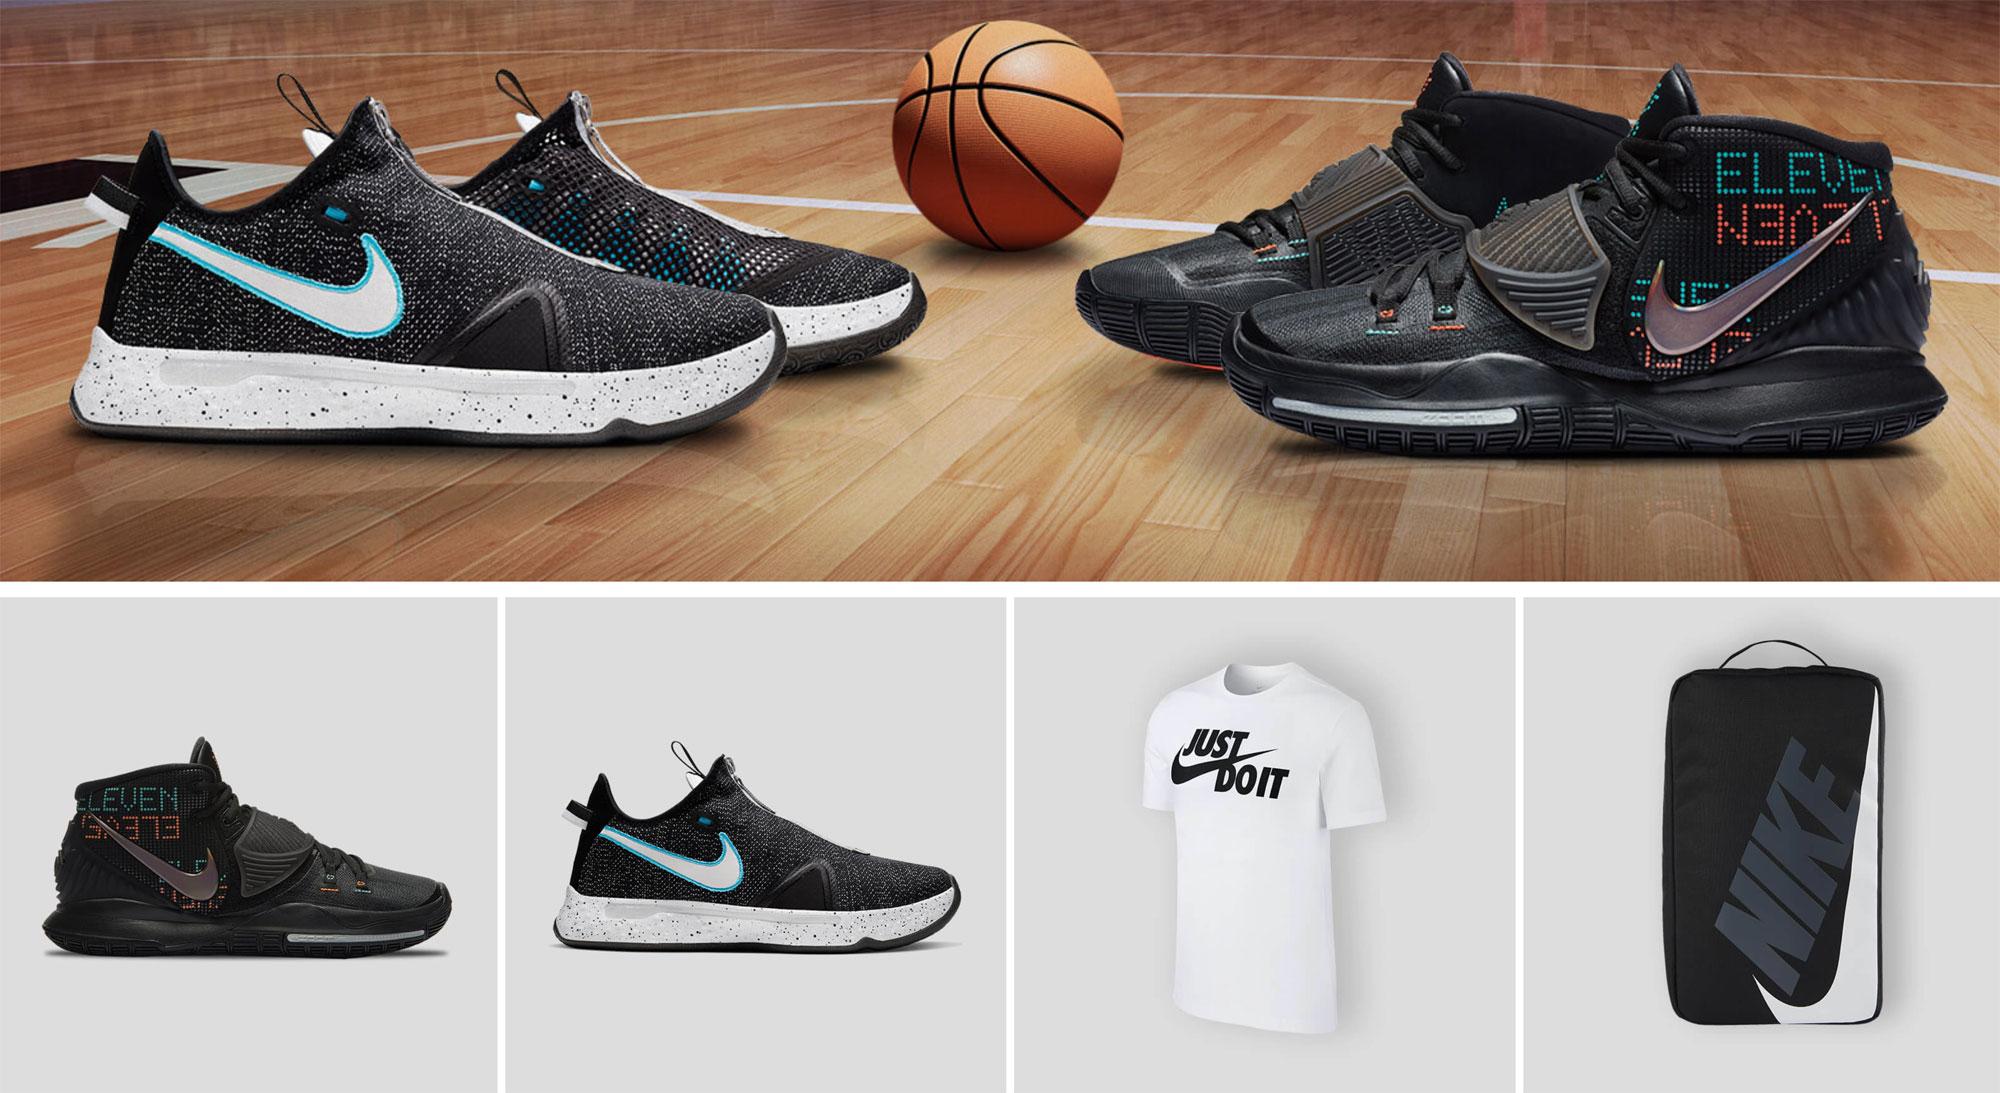 nike-basketball-black-sneaker-pack-gear-match